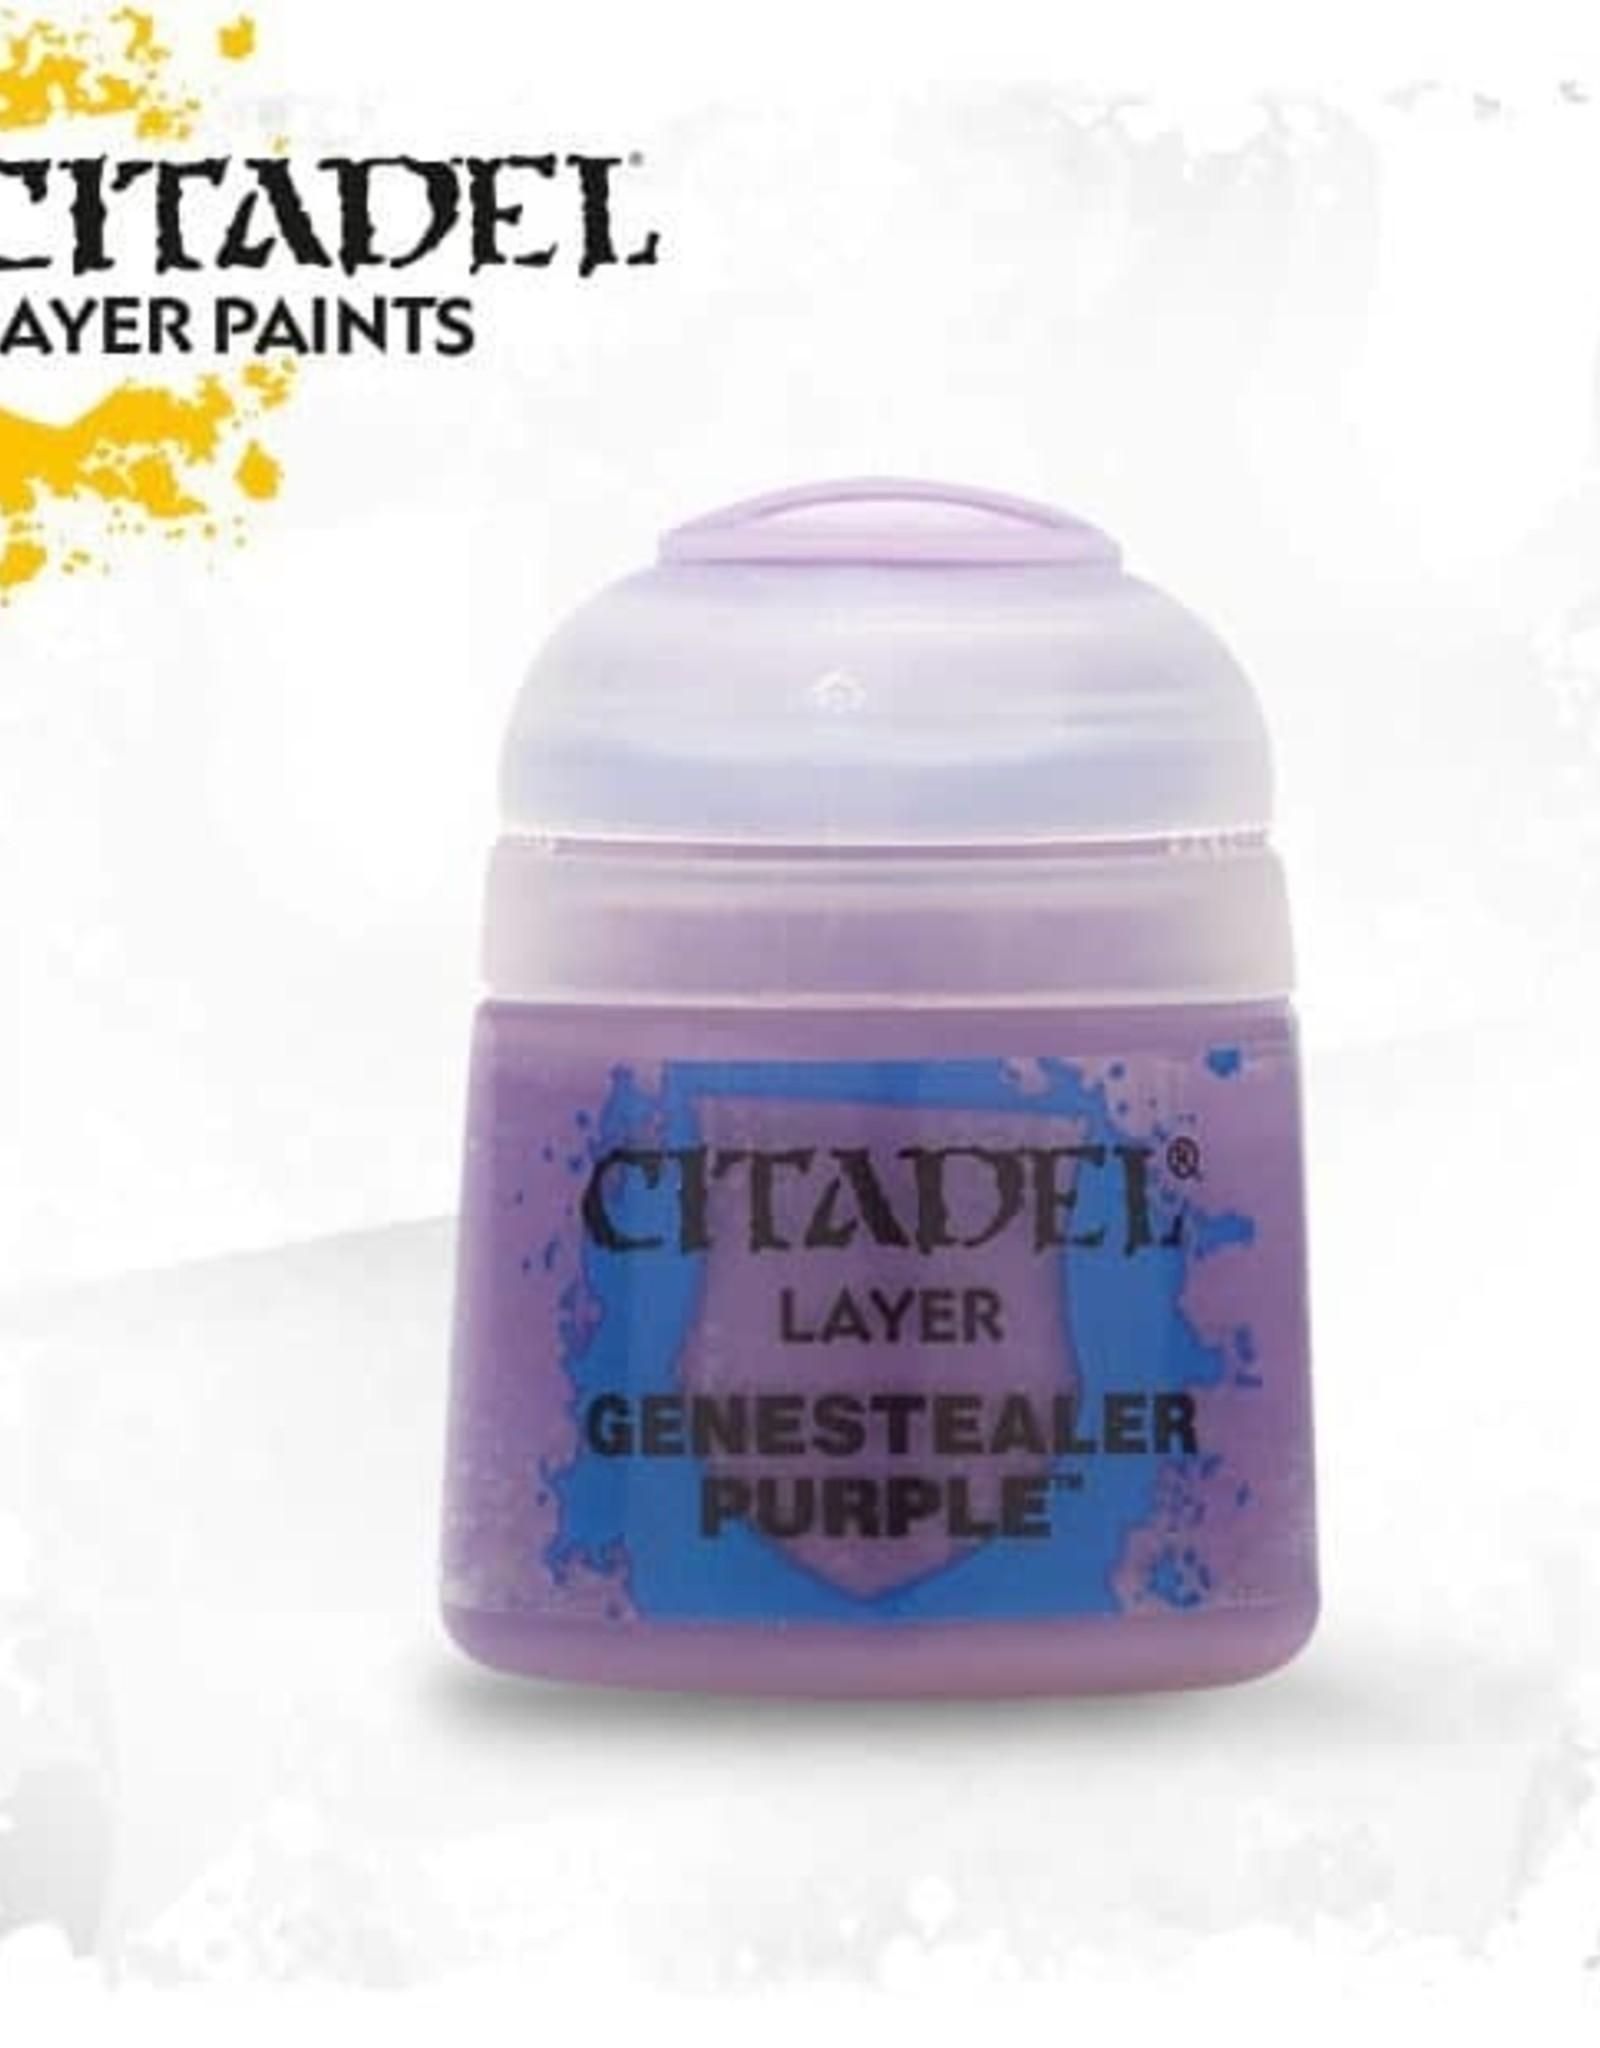 Games Workshop Citadel Paint: Layer - Genestealer Purple